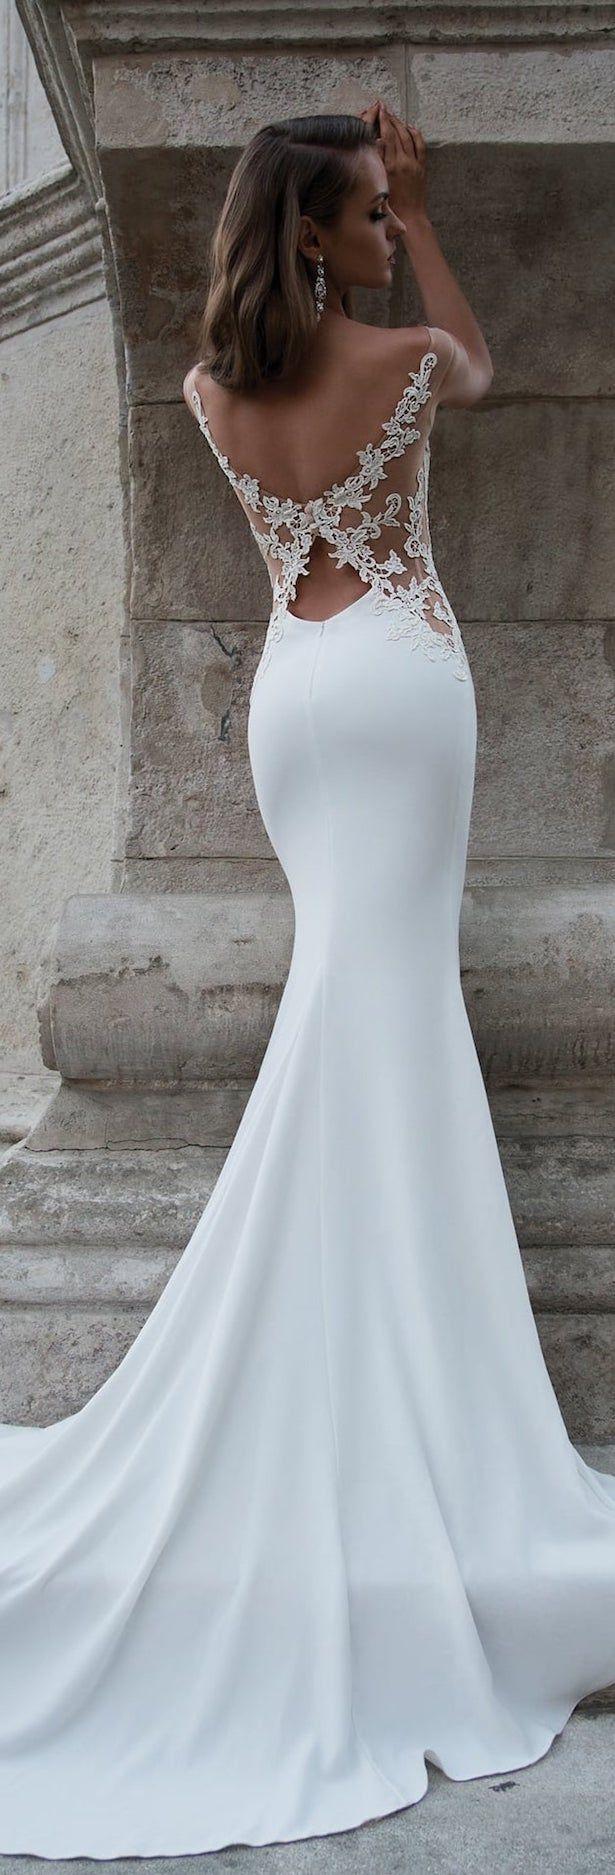 Dominiss Wedding Dress 2017 | indumentaria accesorios | Pinterest ...